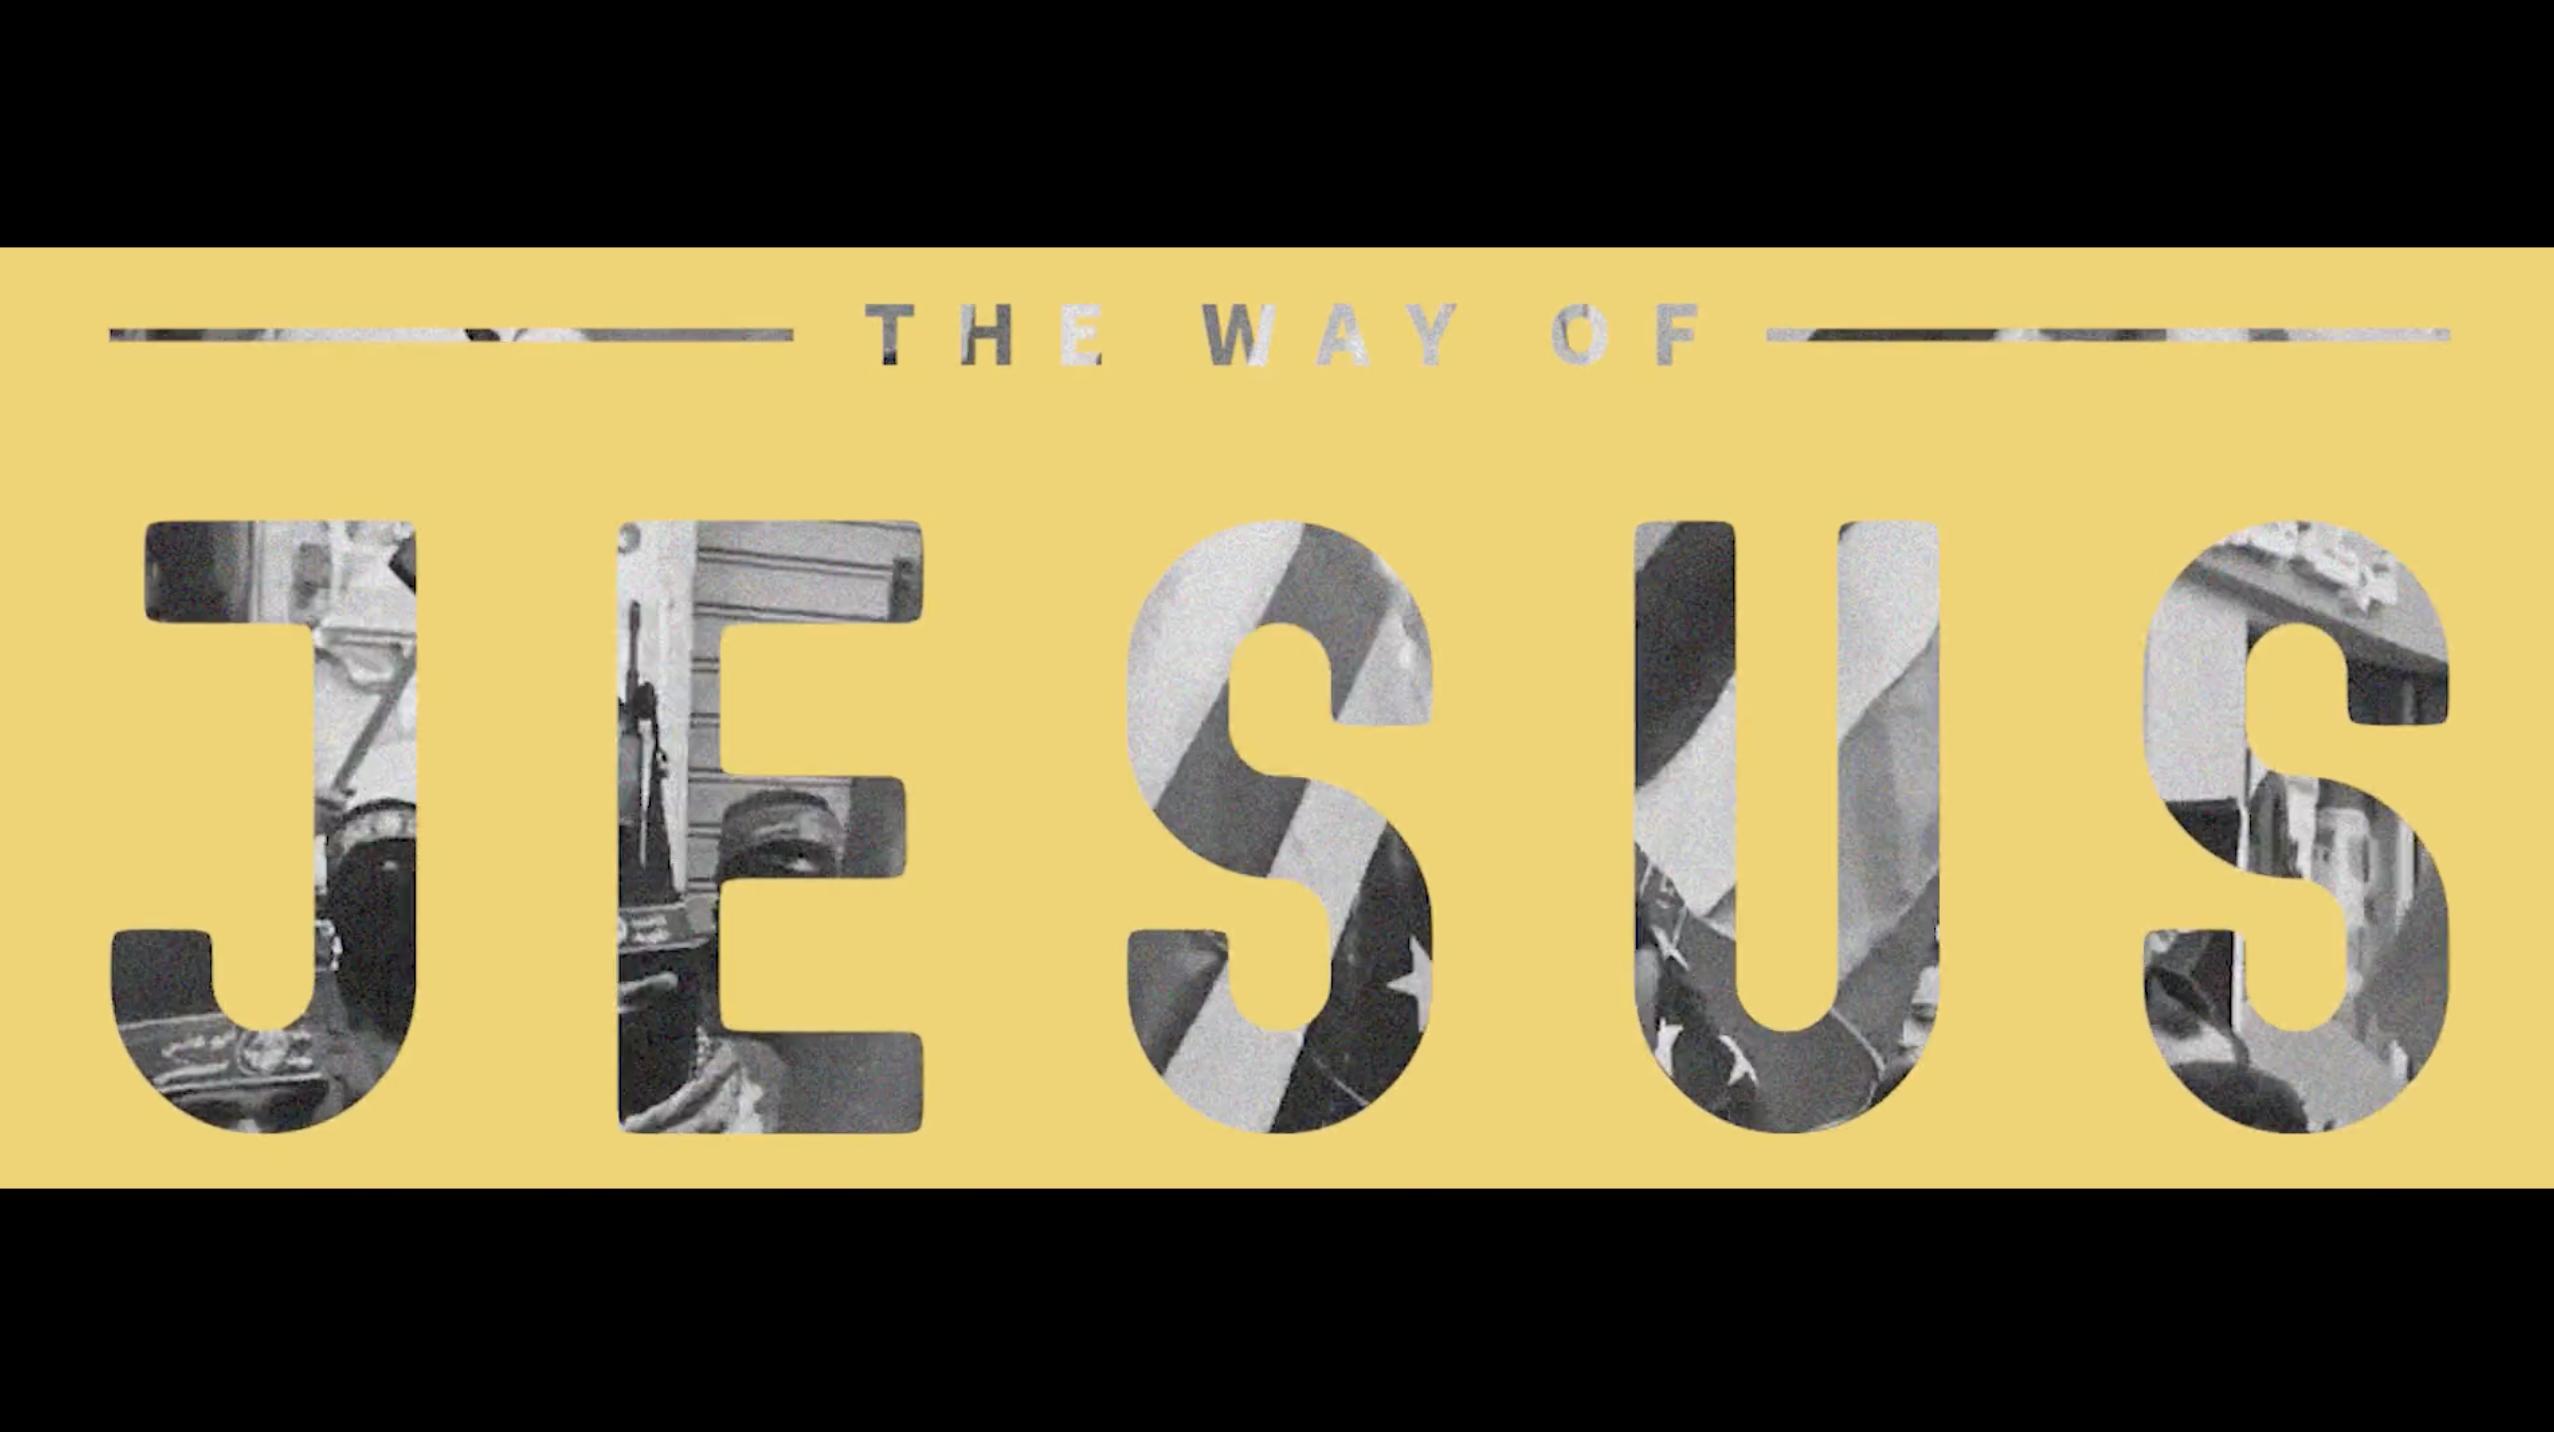 Current Sermon Series: The Way of Jesus